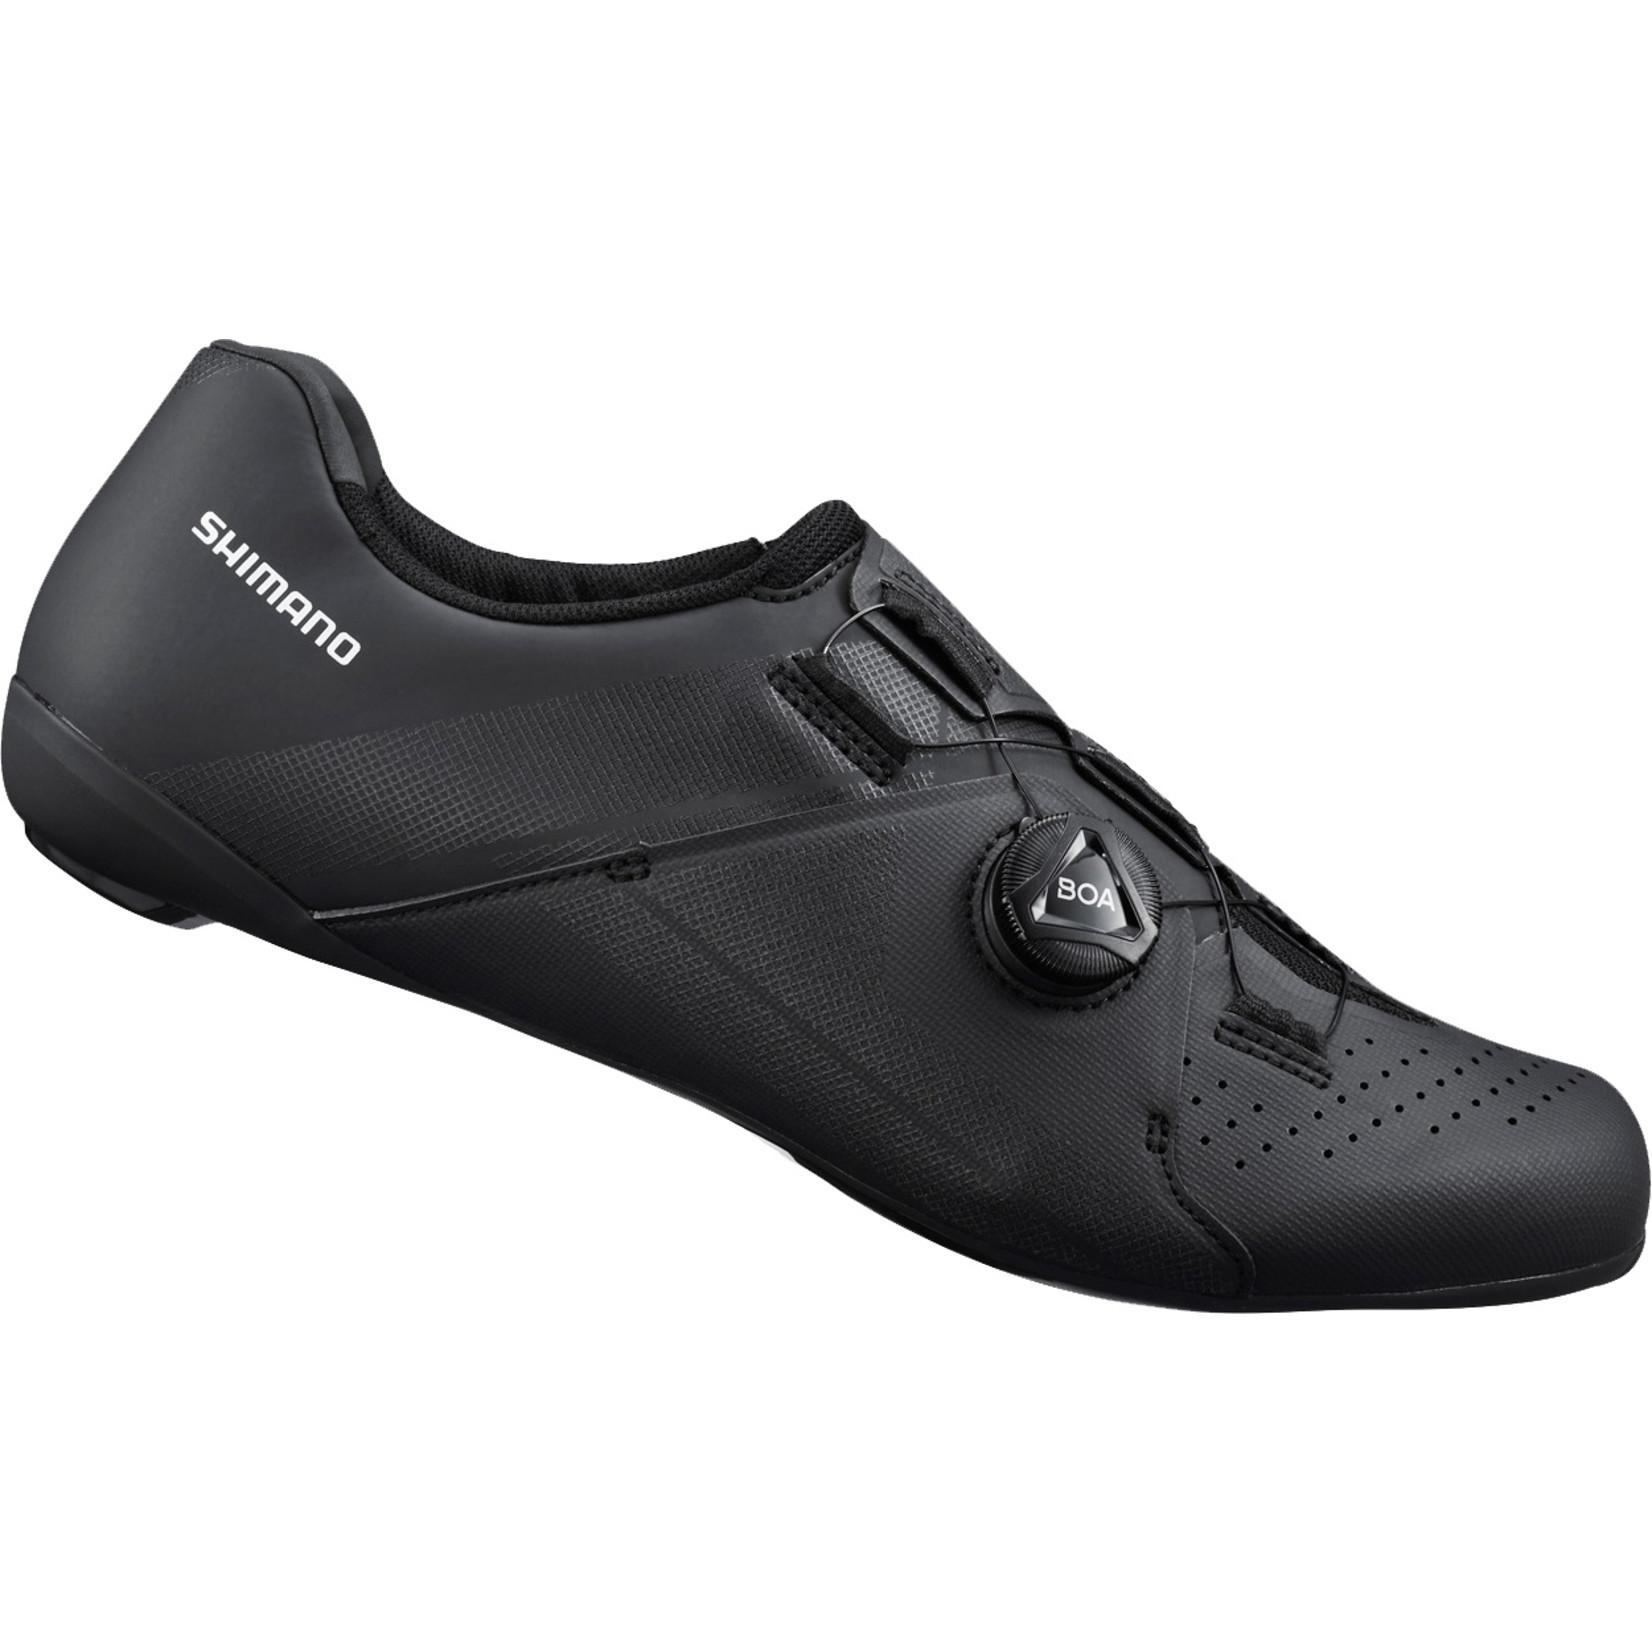 Shimano Shimano RC3 Road Shoes